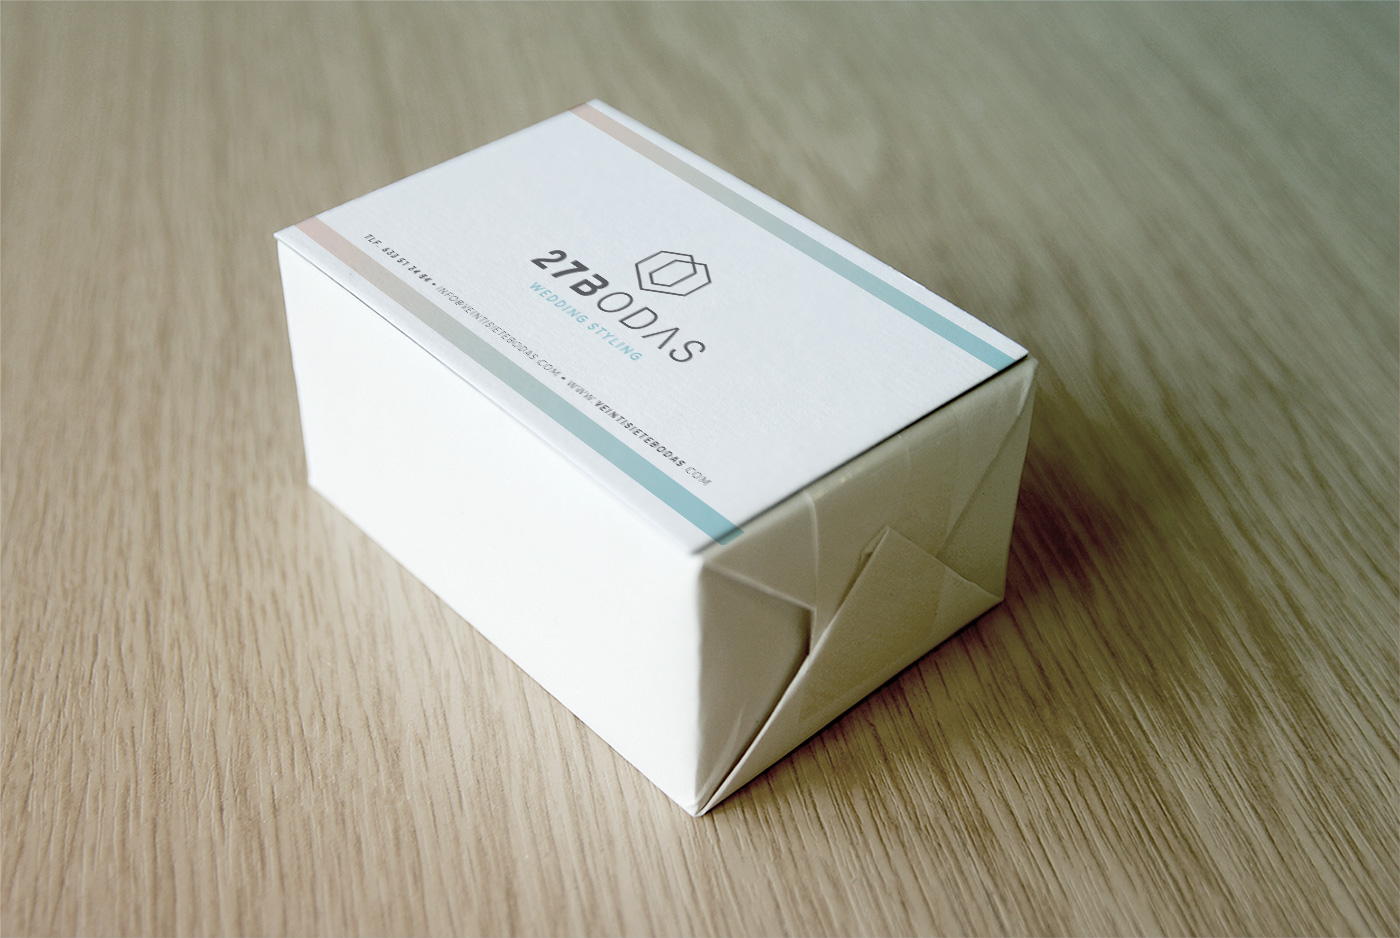 Diseño grafico Albacete, imprenta Albacete, packaging empresa Albacete, 27 bodas